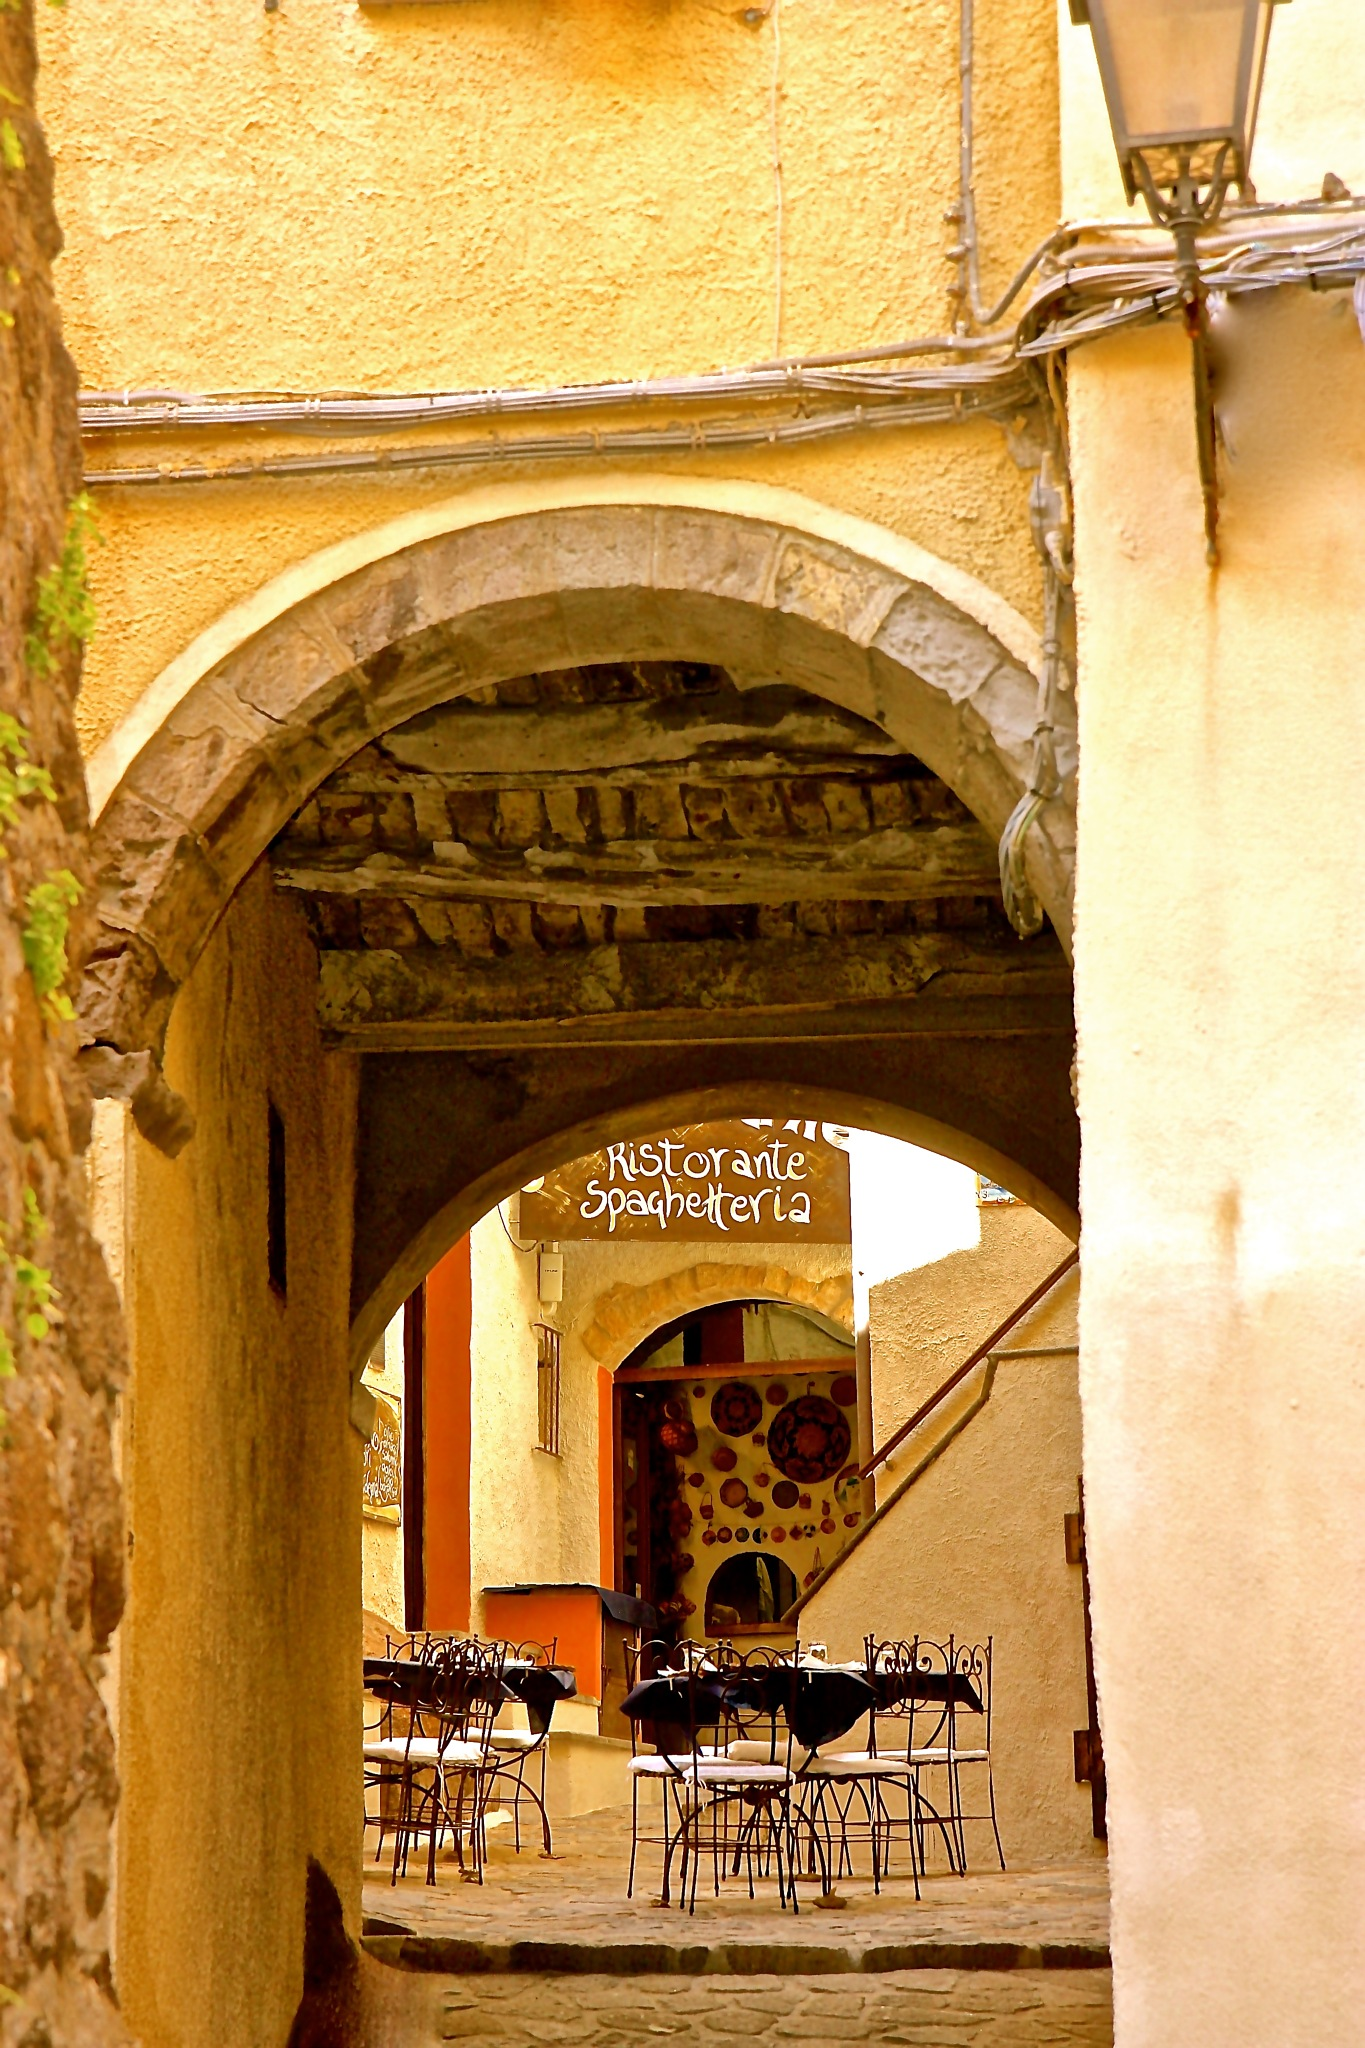 Sardinia Splendor by Steven Thomas Densley